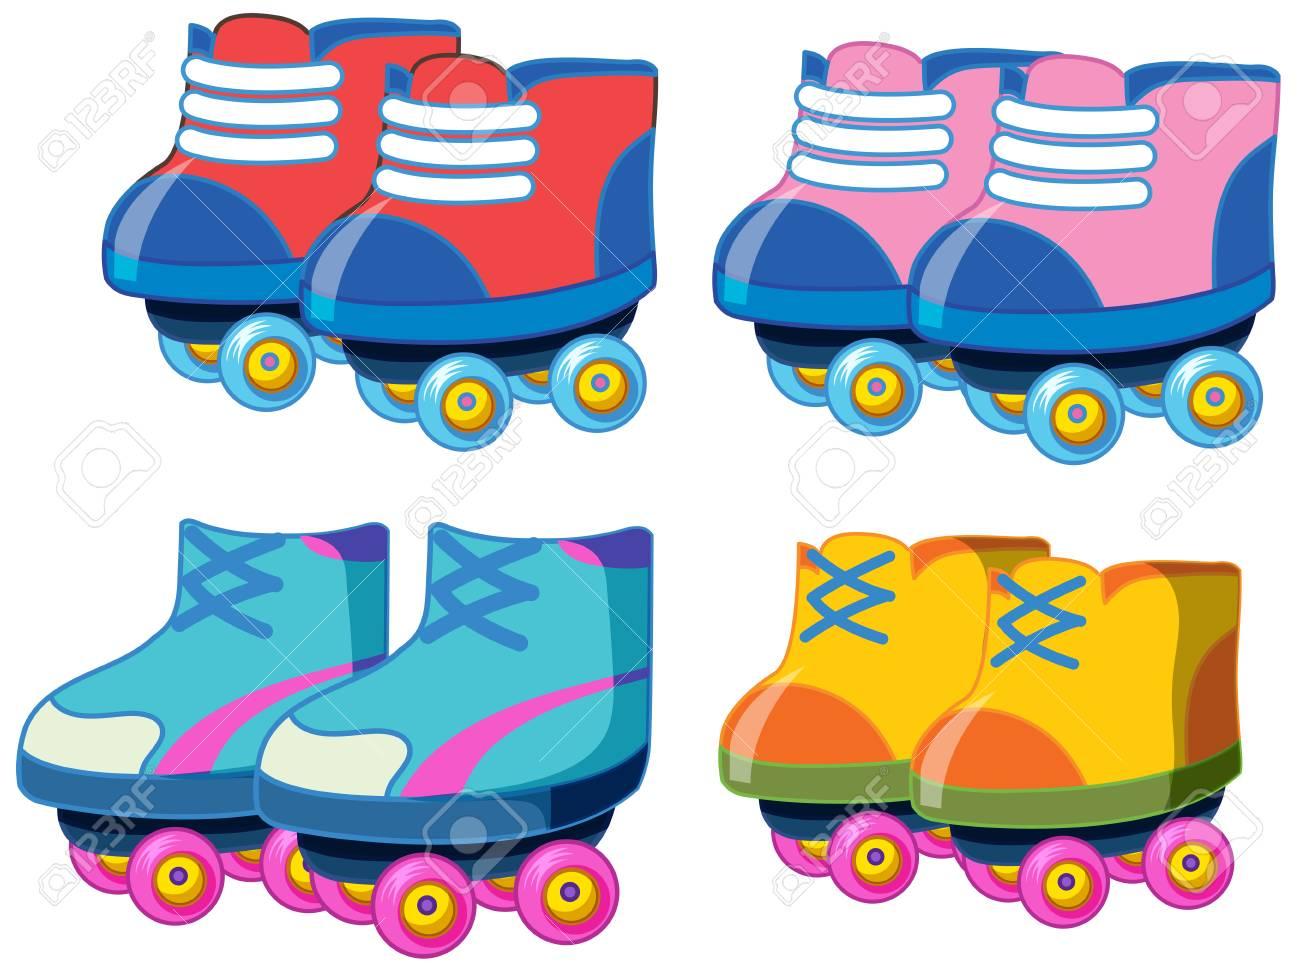 hight resolution of set of roller skate shoes illustration stock vector 121751864